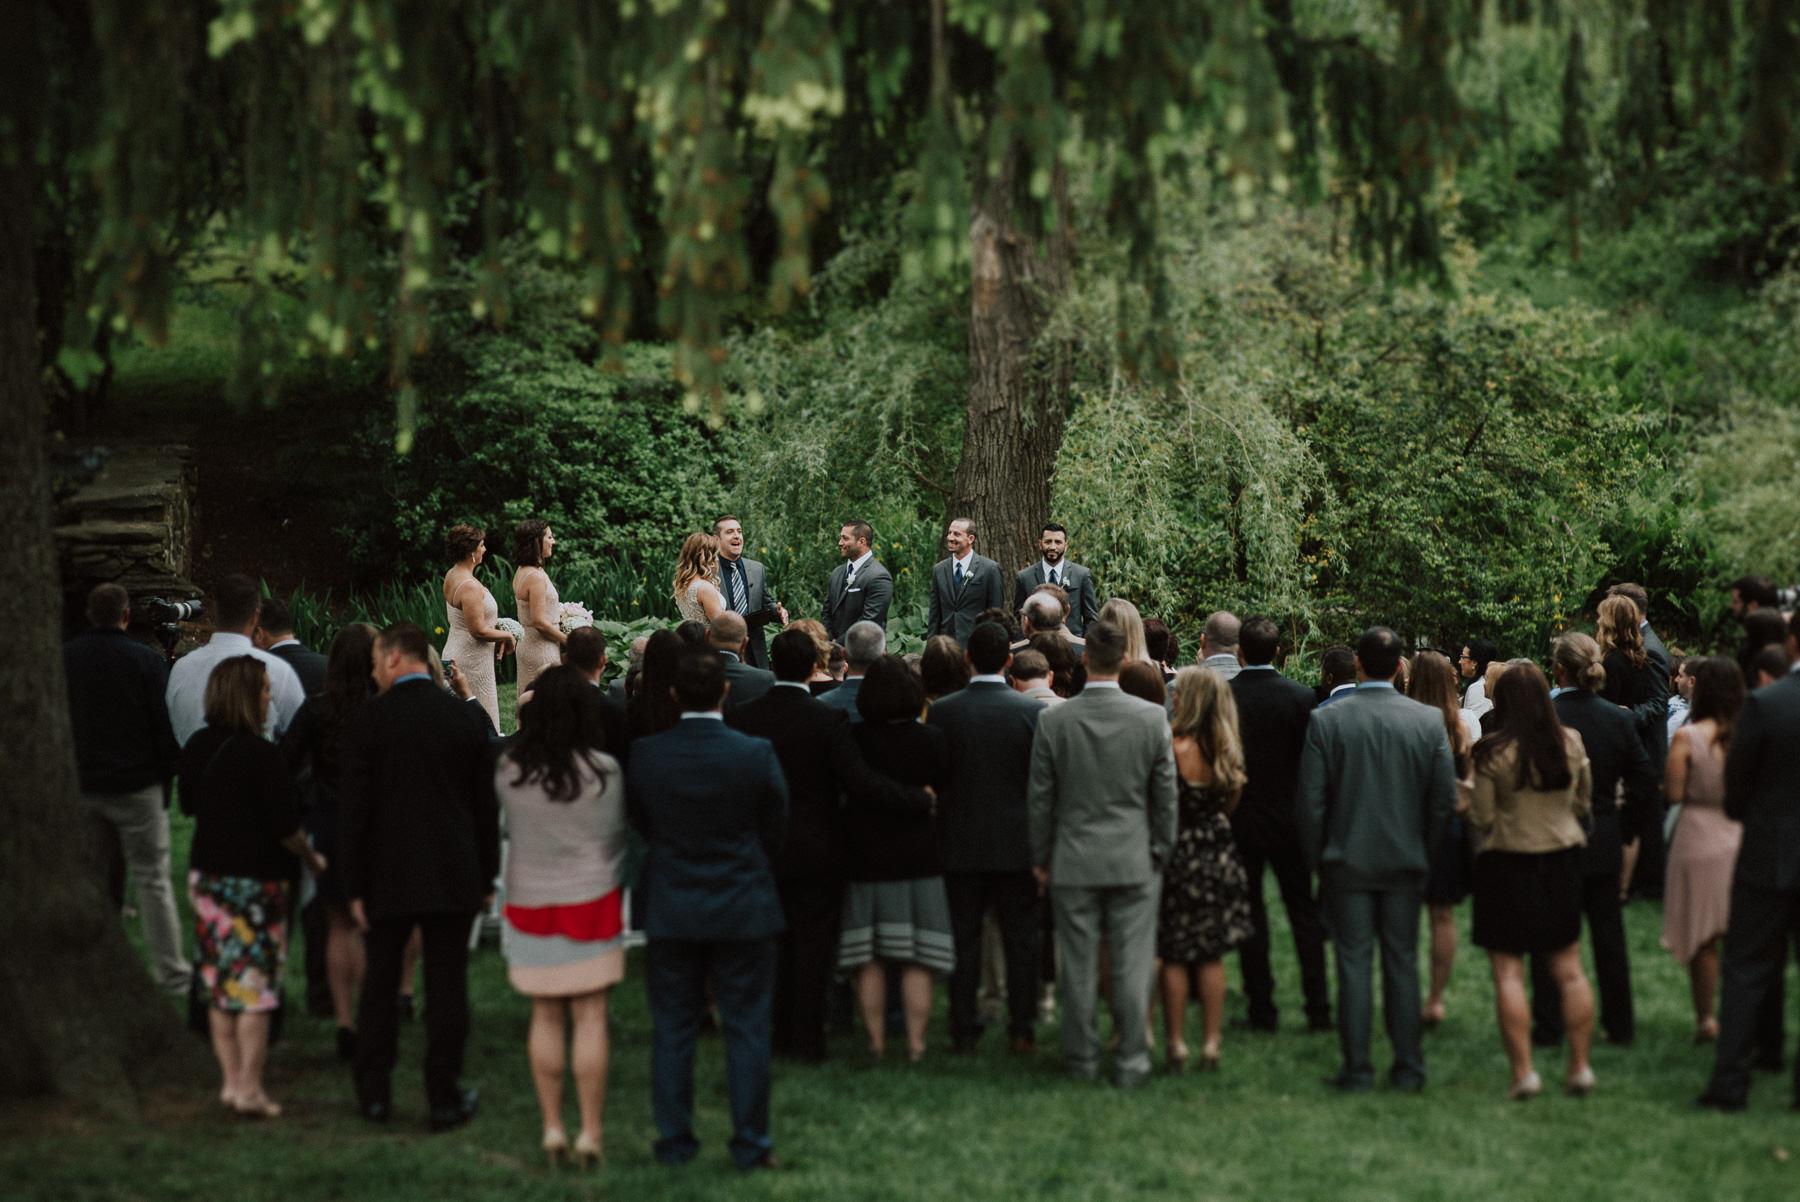 appleford-estate-wedding-photography-57.jpg